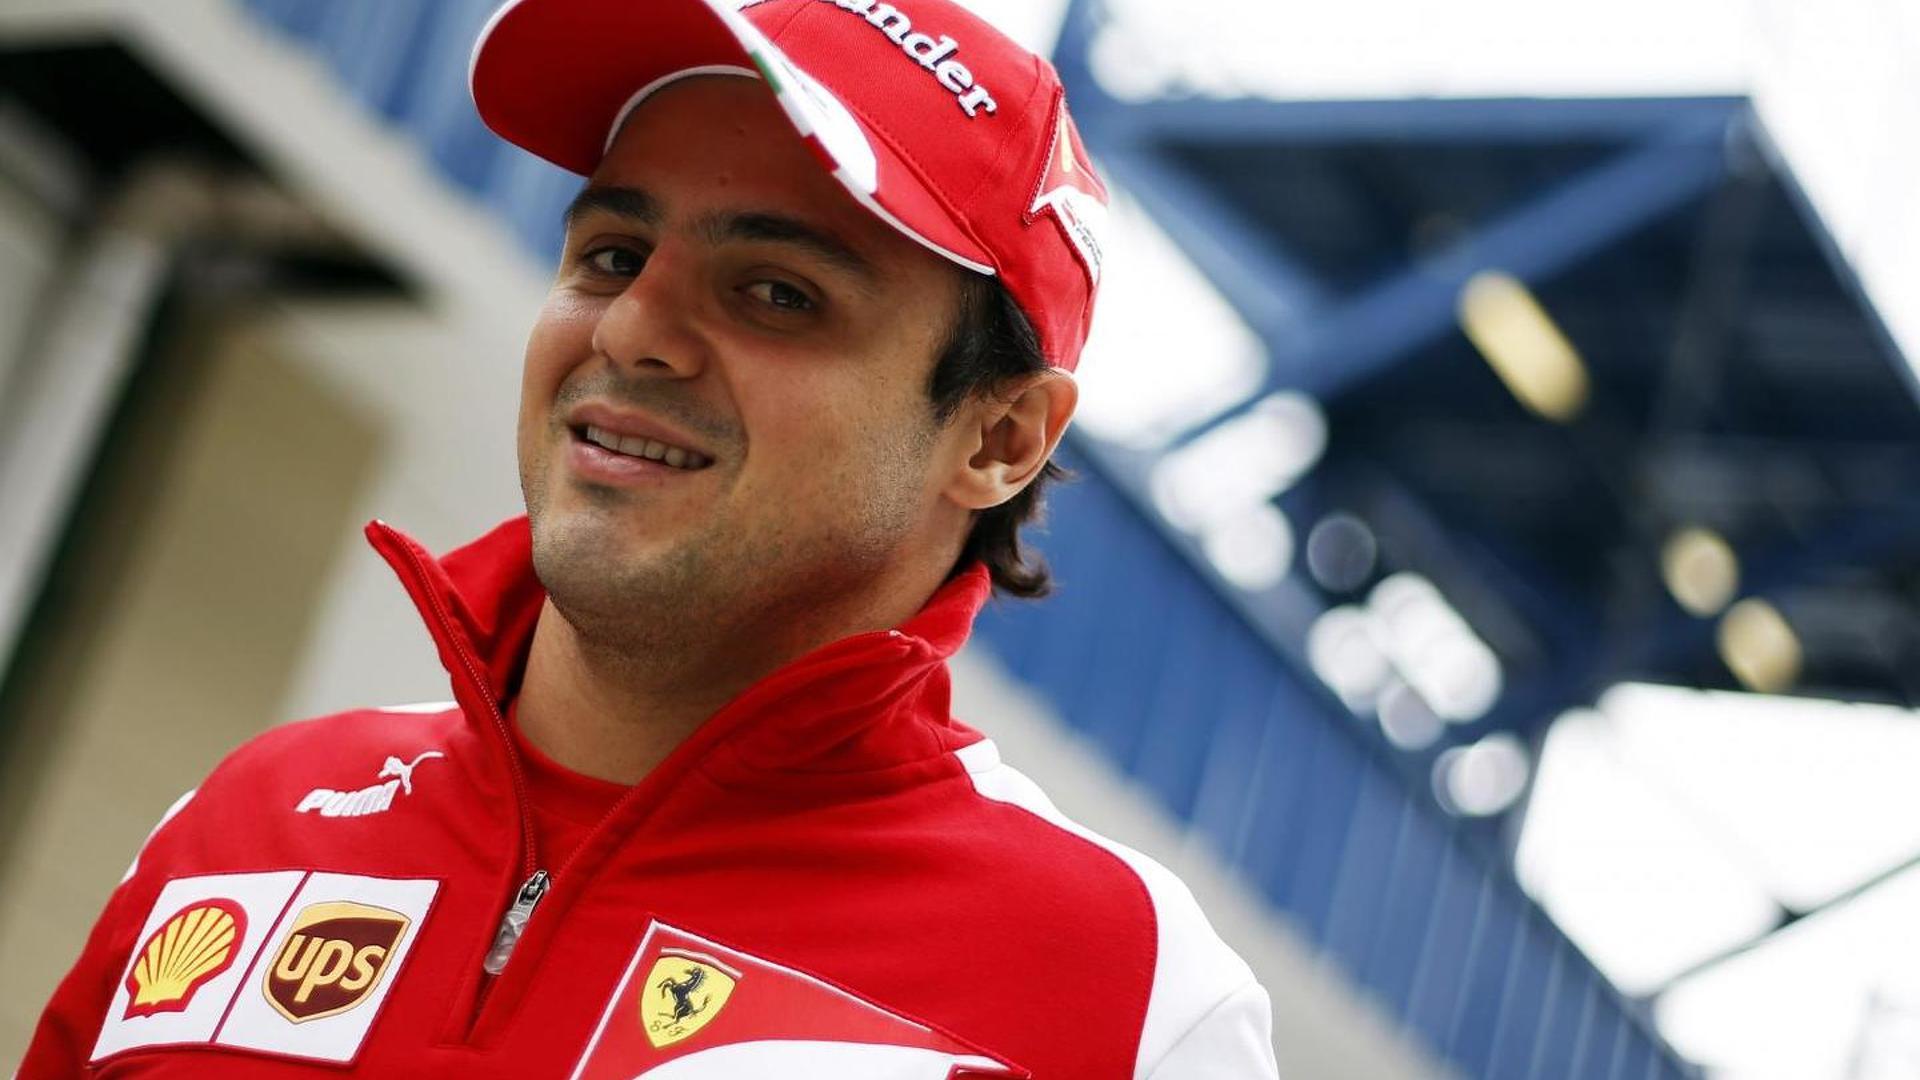 Williams best place for Massa - Maldonado